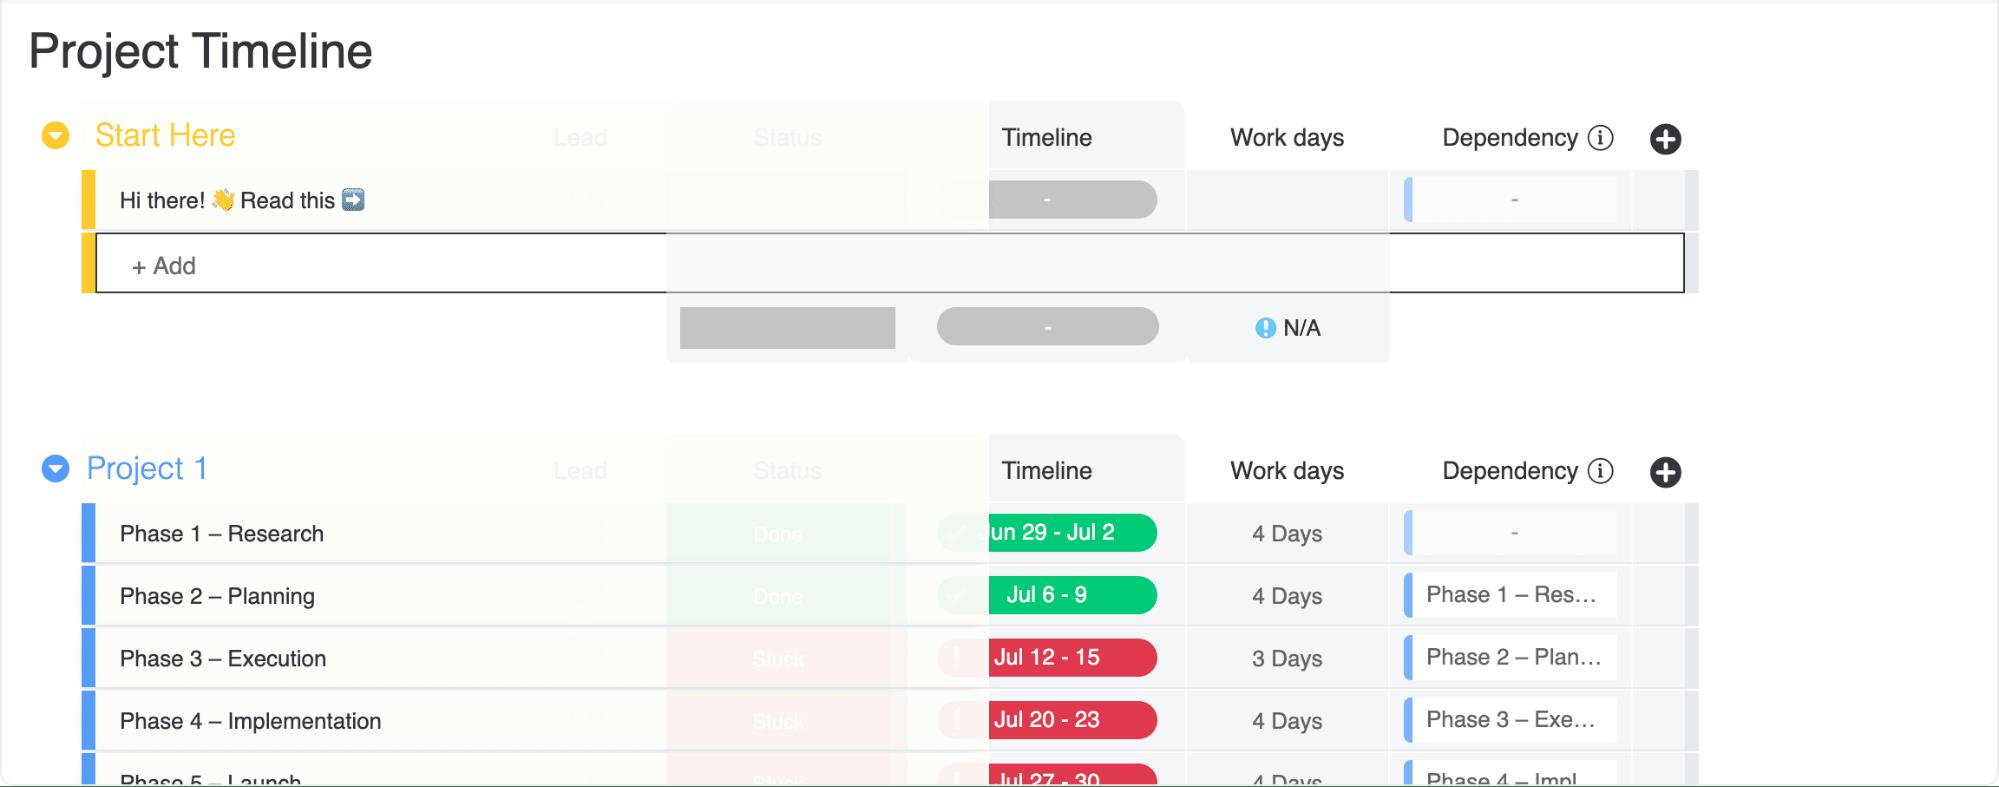 monday.com project timeline template